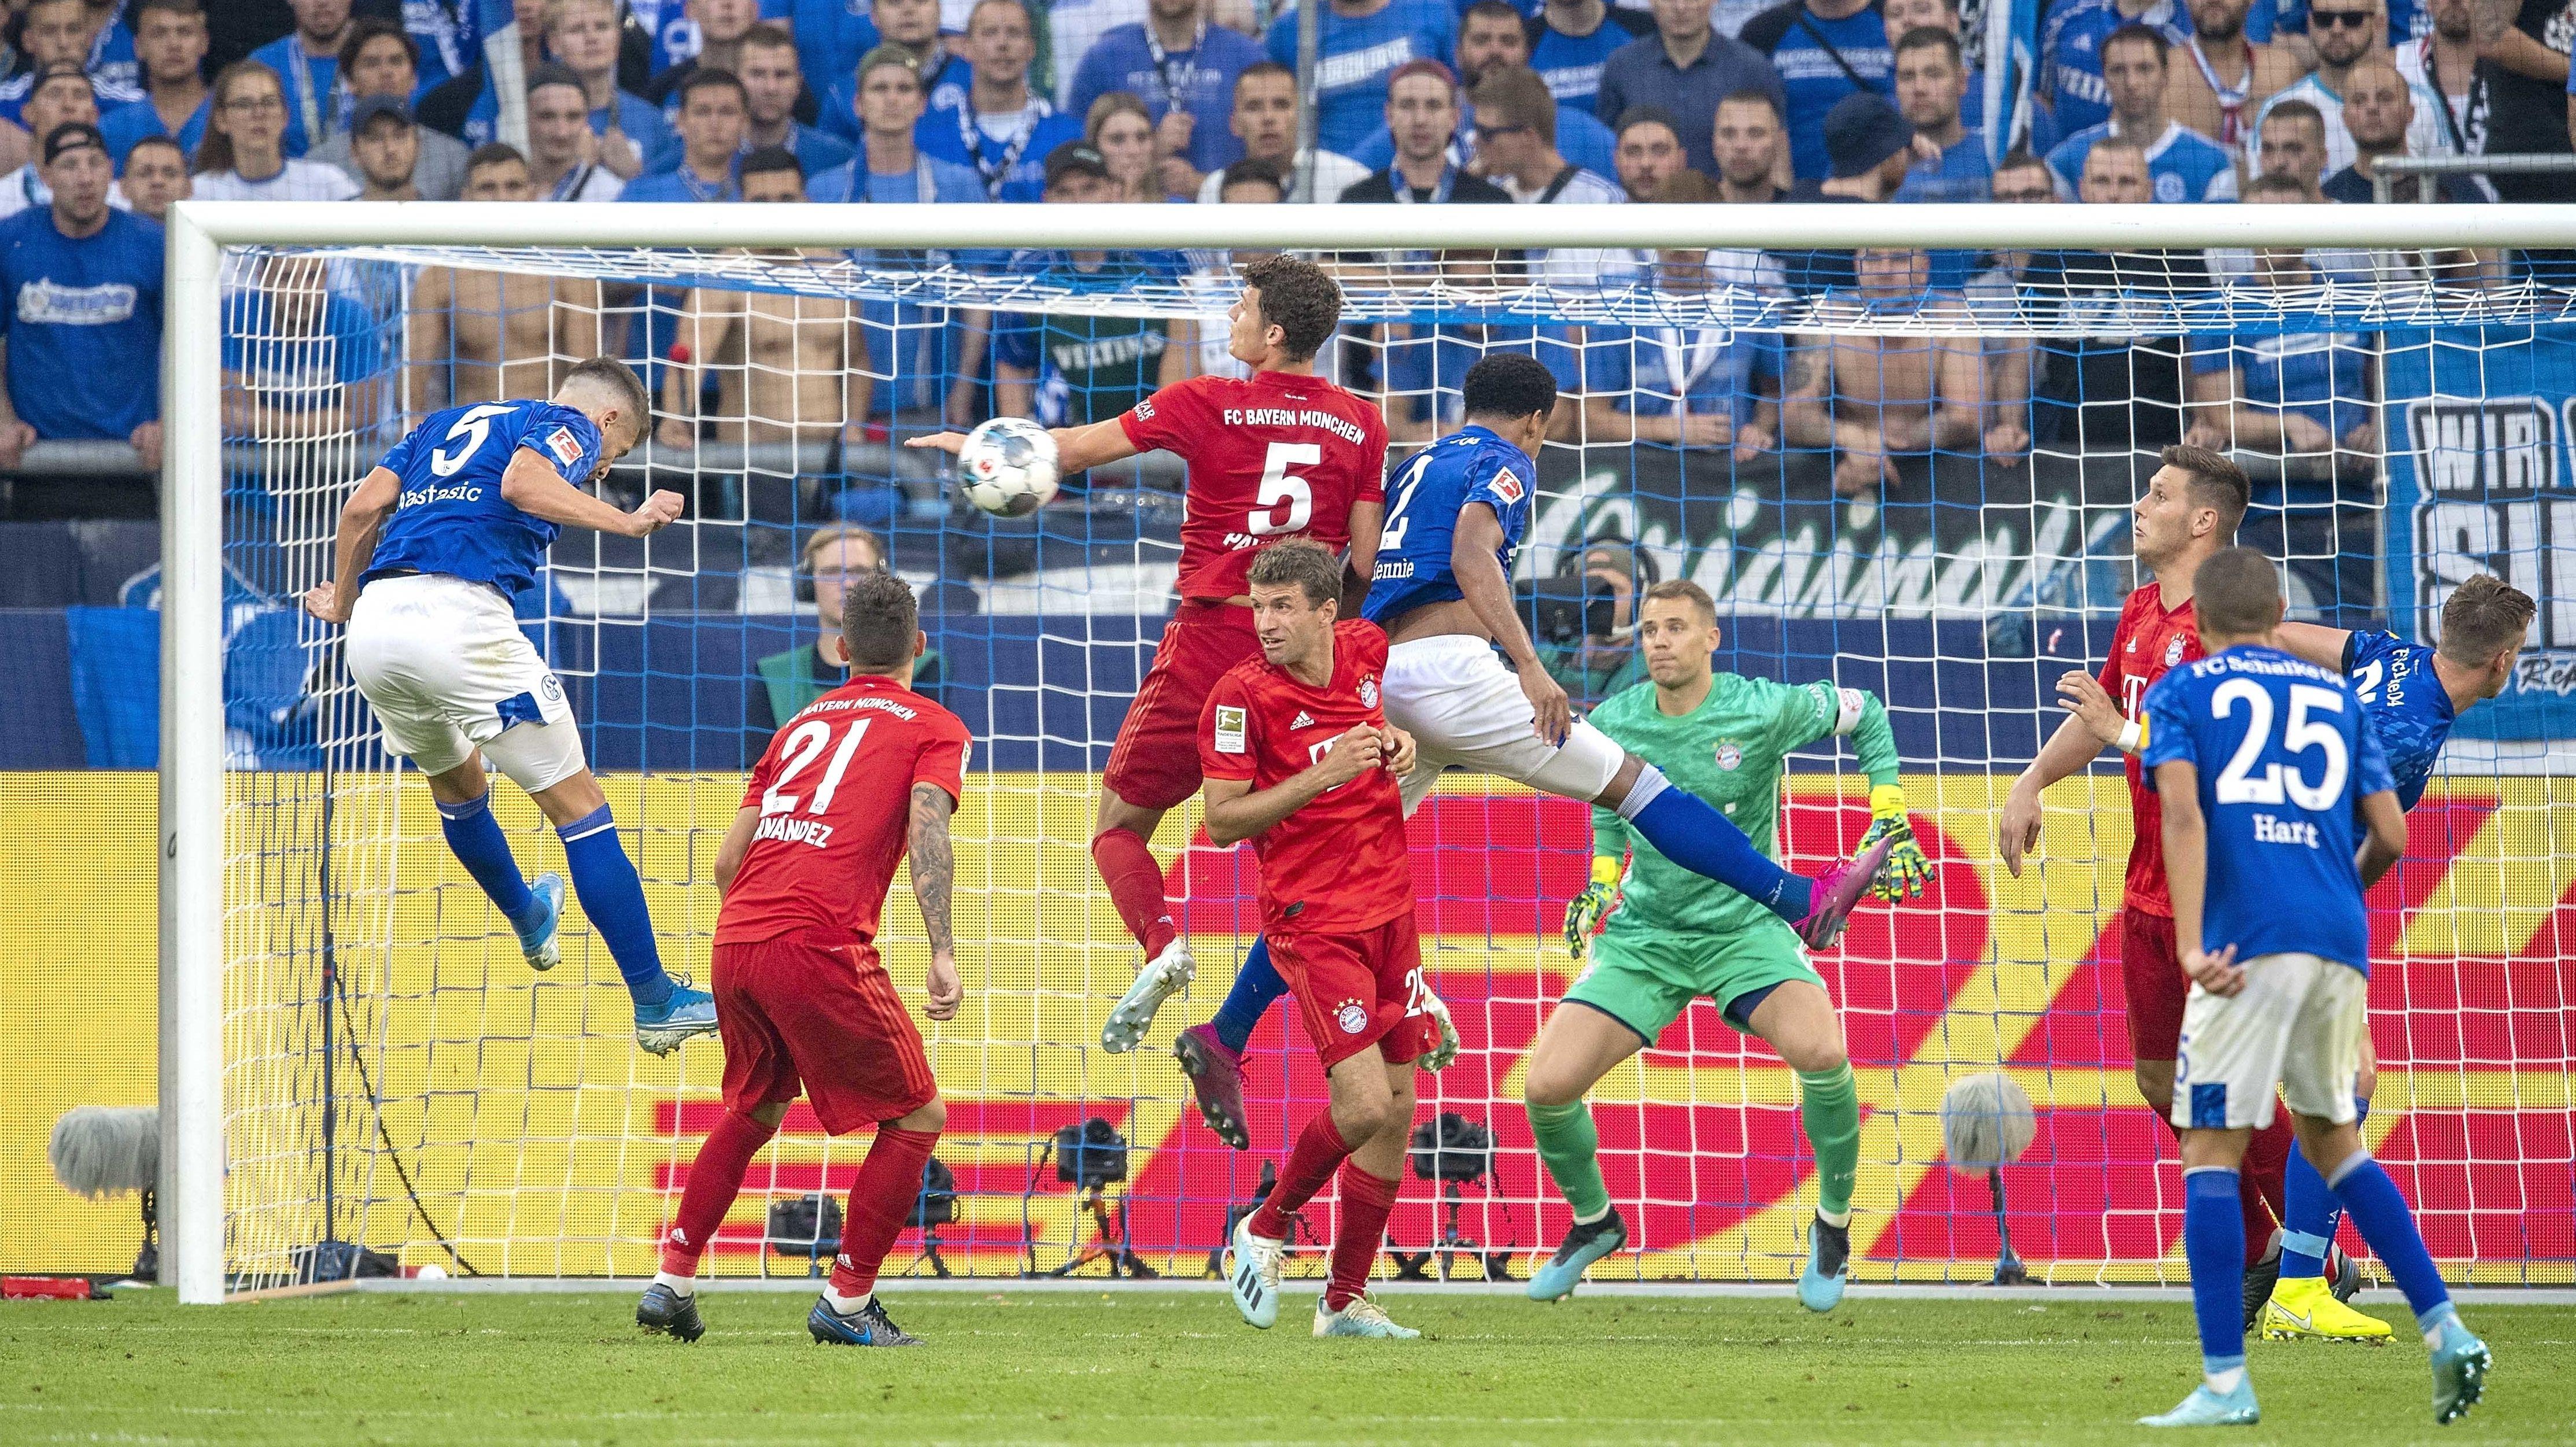 Handspiel oder nicht? Bayerns Pavard (Nummer 5) bekommt einen Kopfball an den linken Arm